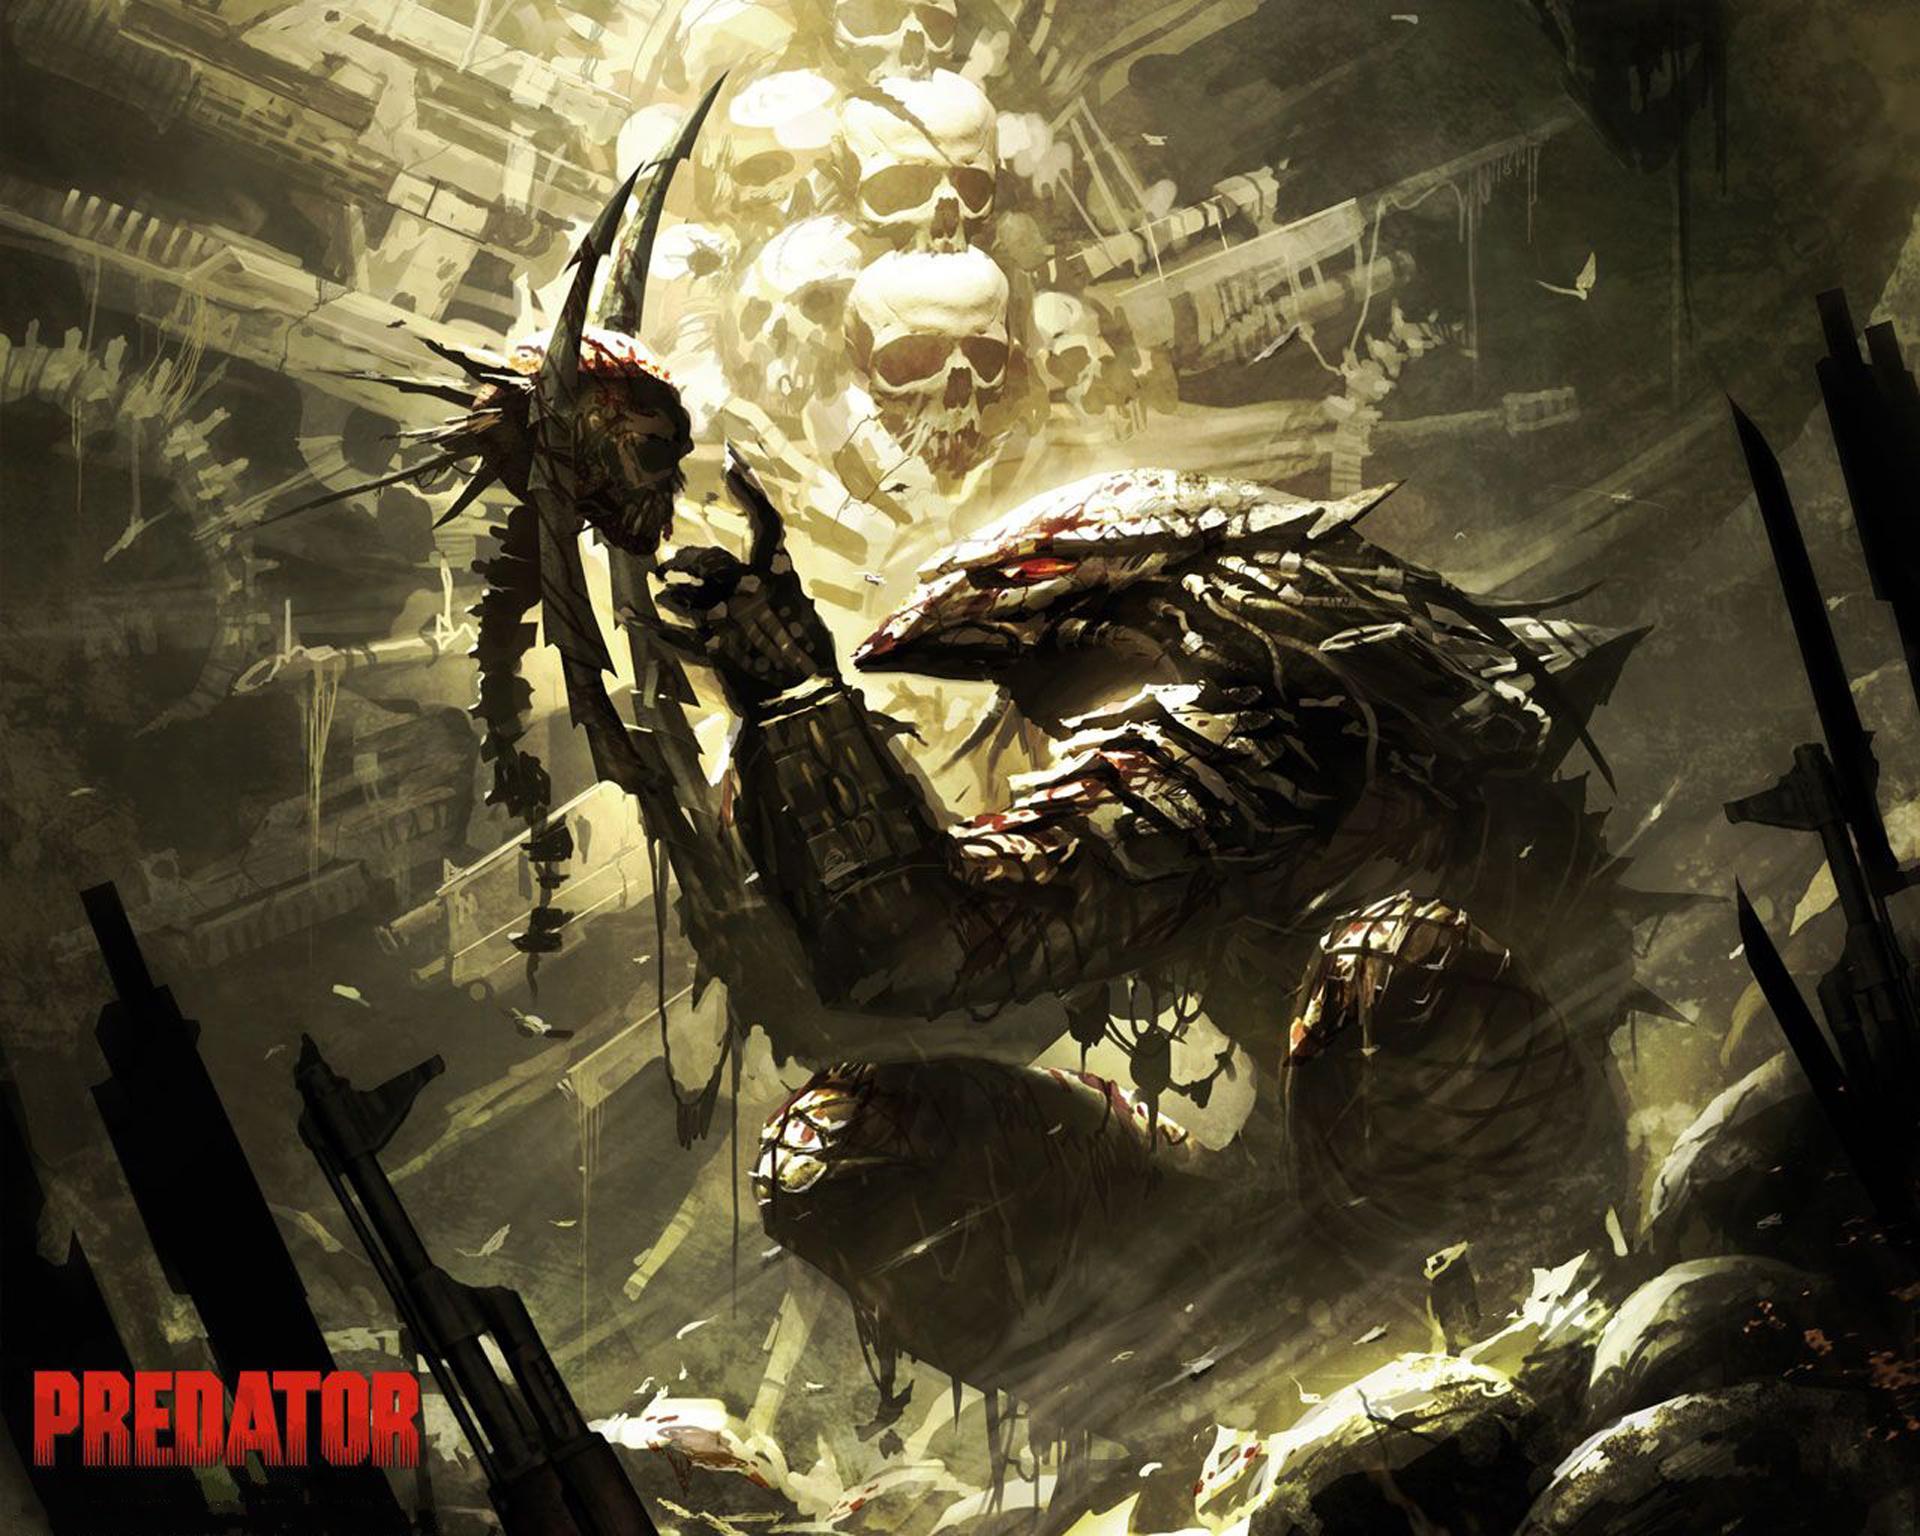 Predator 2015 online games